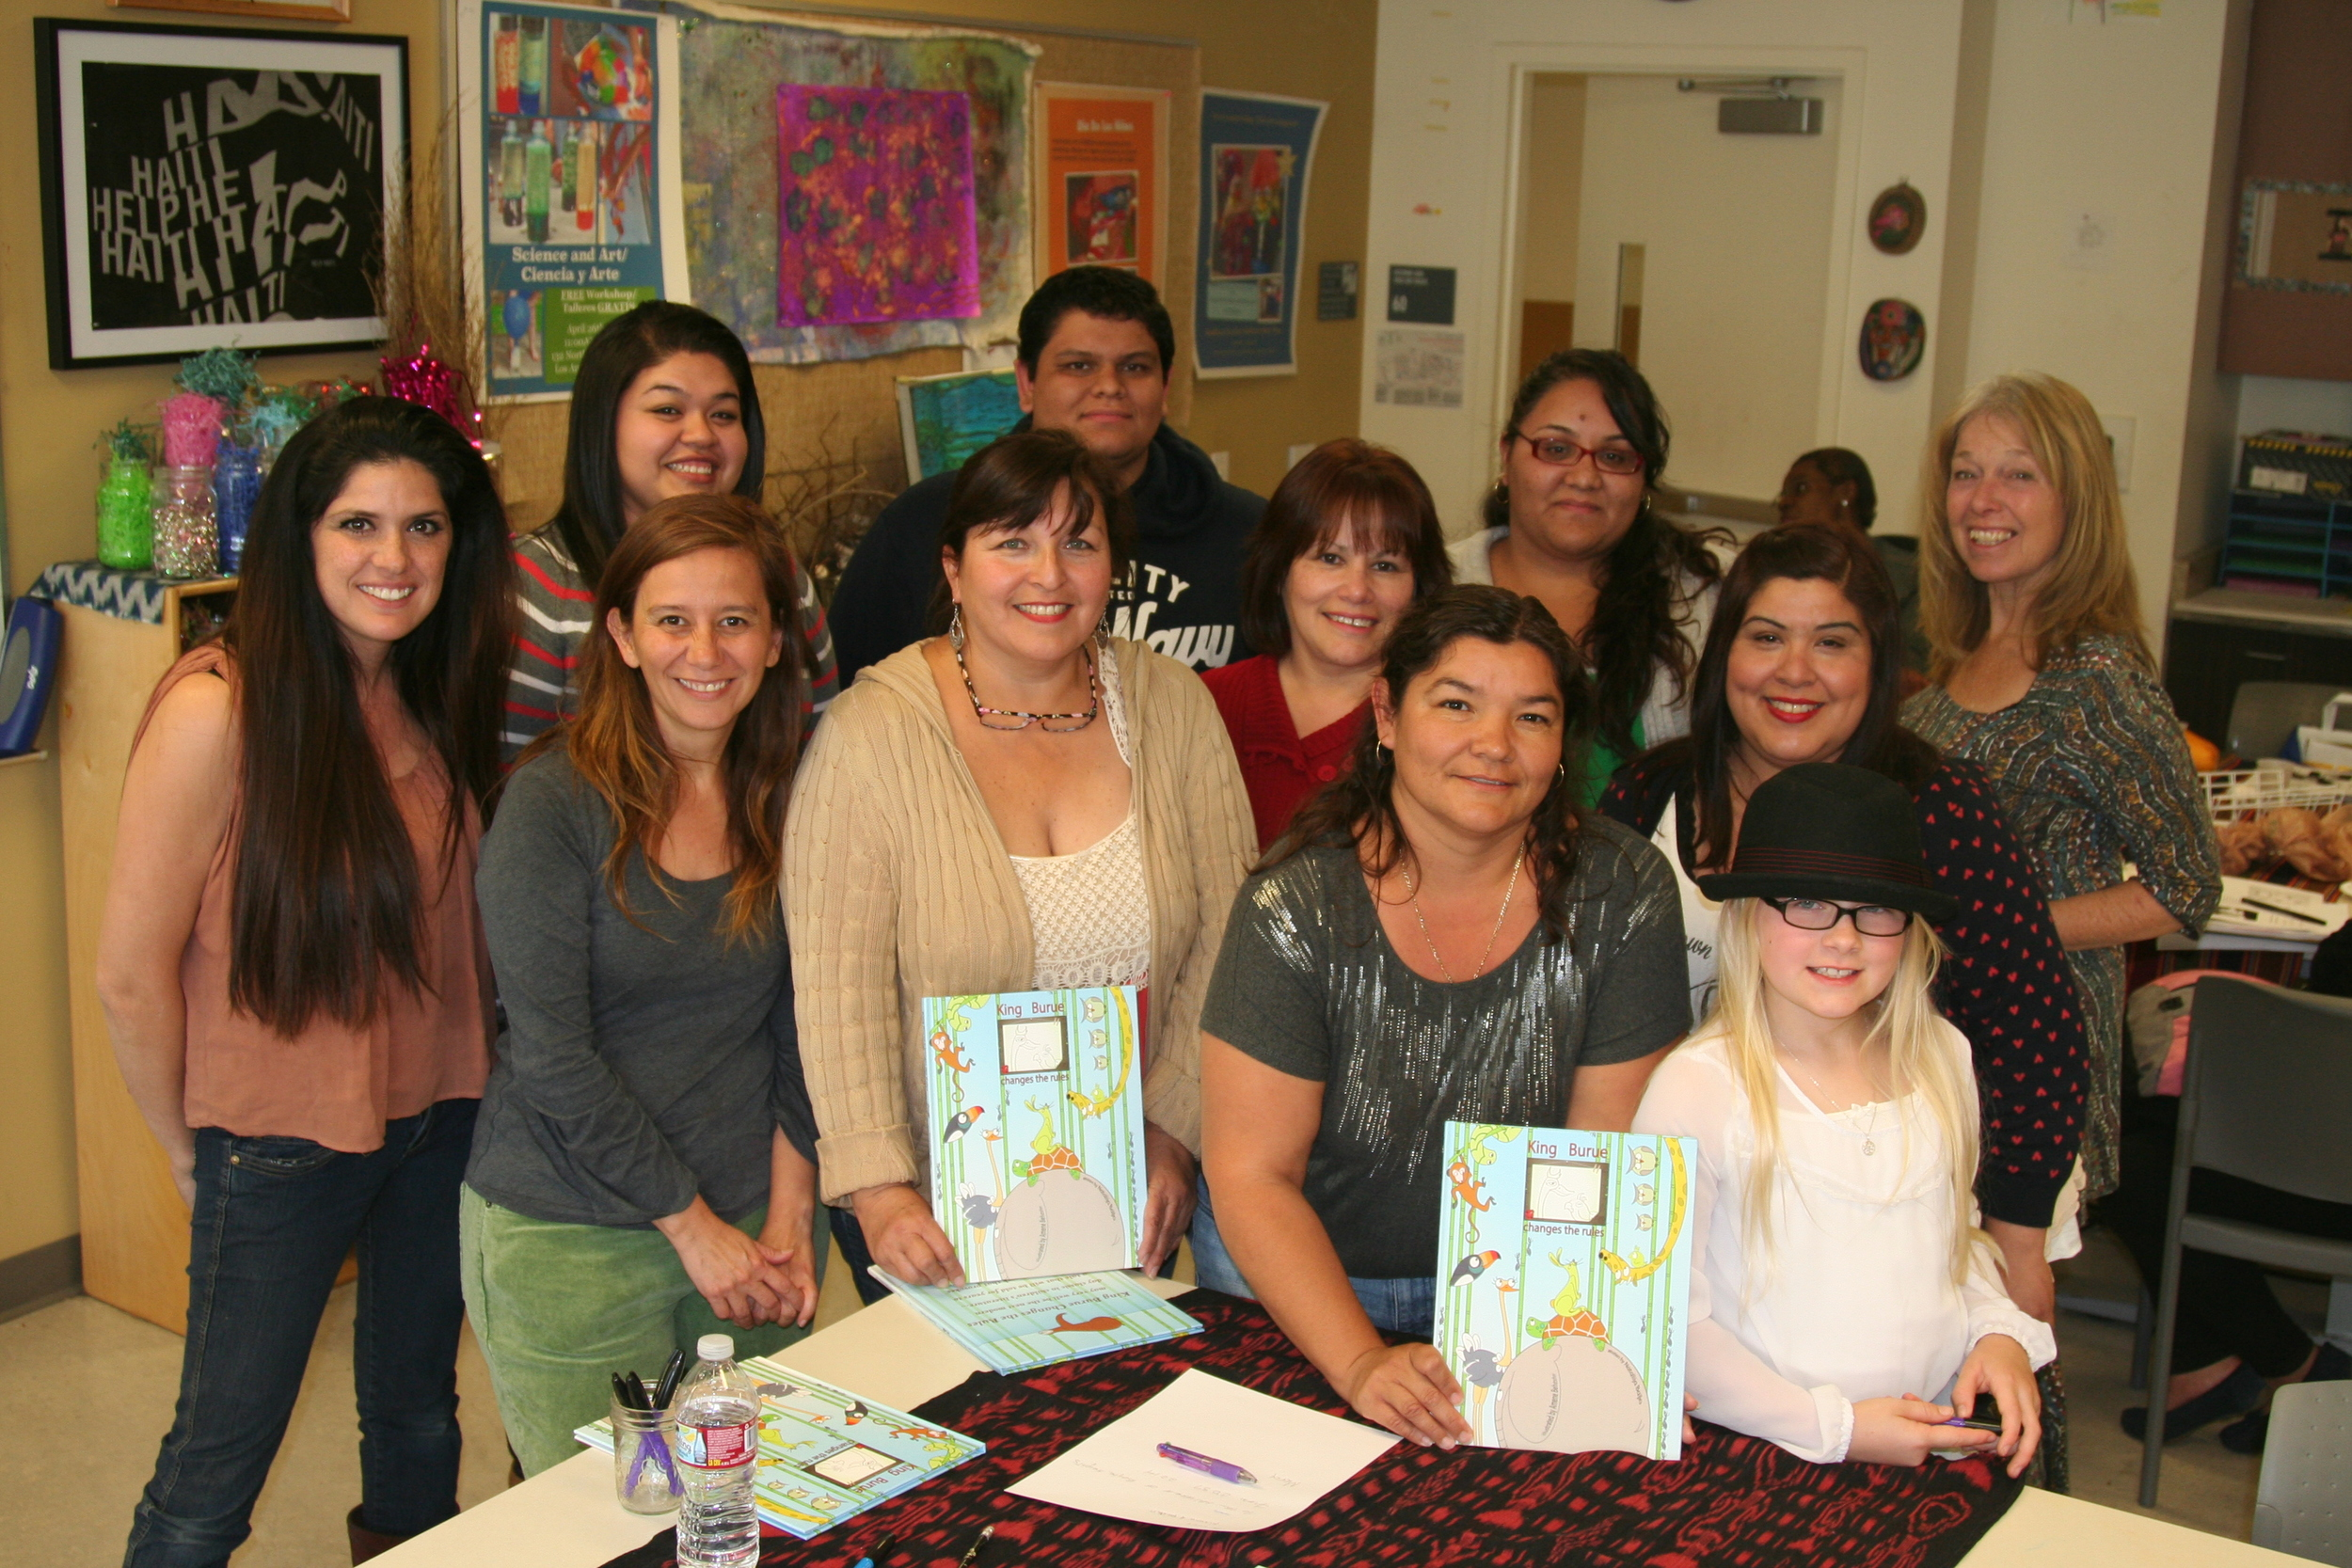 The team; Marisa, Robert, Mercedes, Daisy, Sandra, Susan and Lydia and Professor Wilbur.